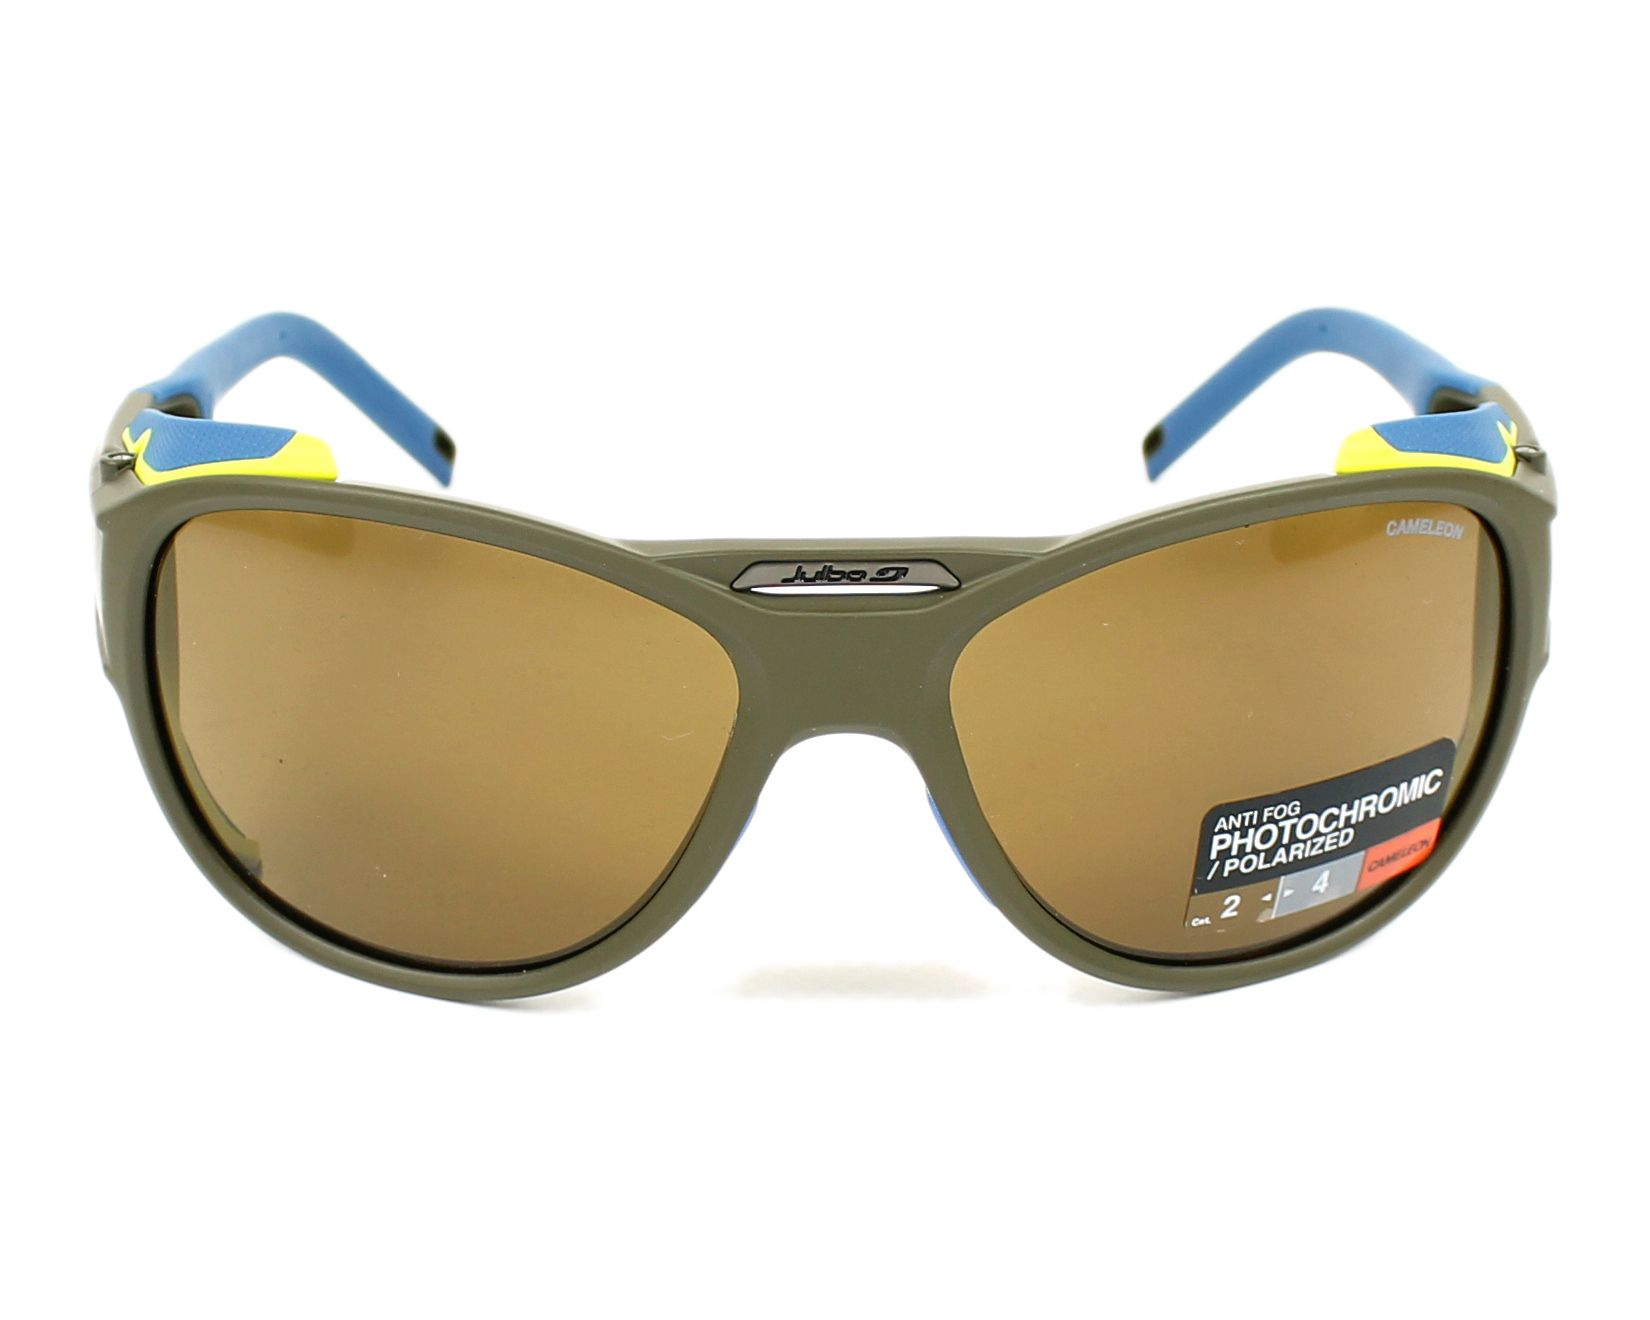 ... 1214 Sunglasses Grey   SmartBuyGlasses India Julbo Explorer 2.0 Glacier  Goggles   Price   Reviews   Massdrop Julbo Sunglasses J497 5054 Khaki with  Brown 4bb83f171d2e